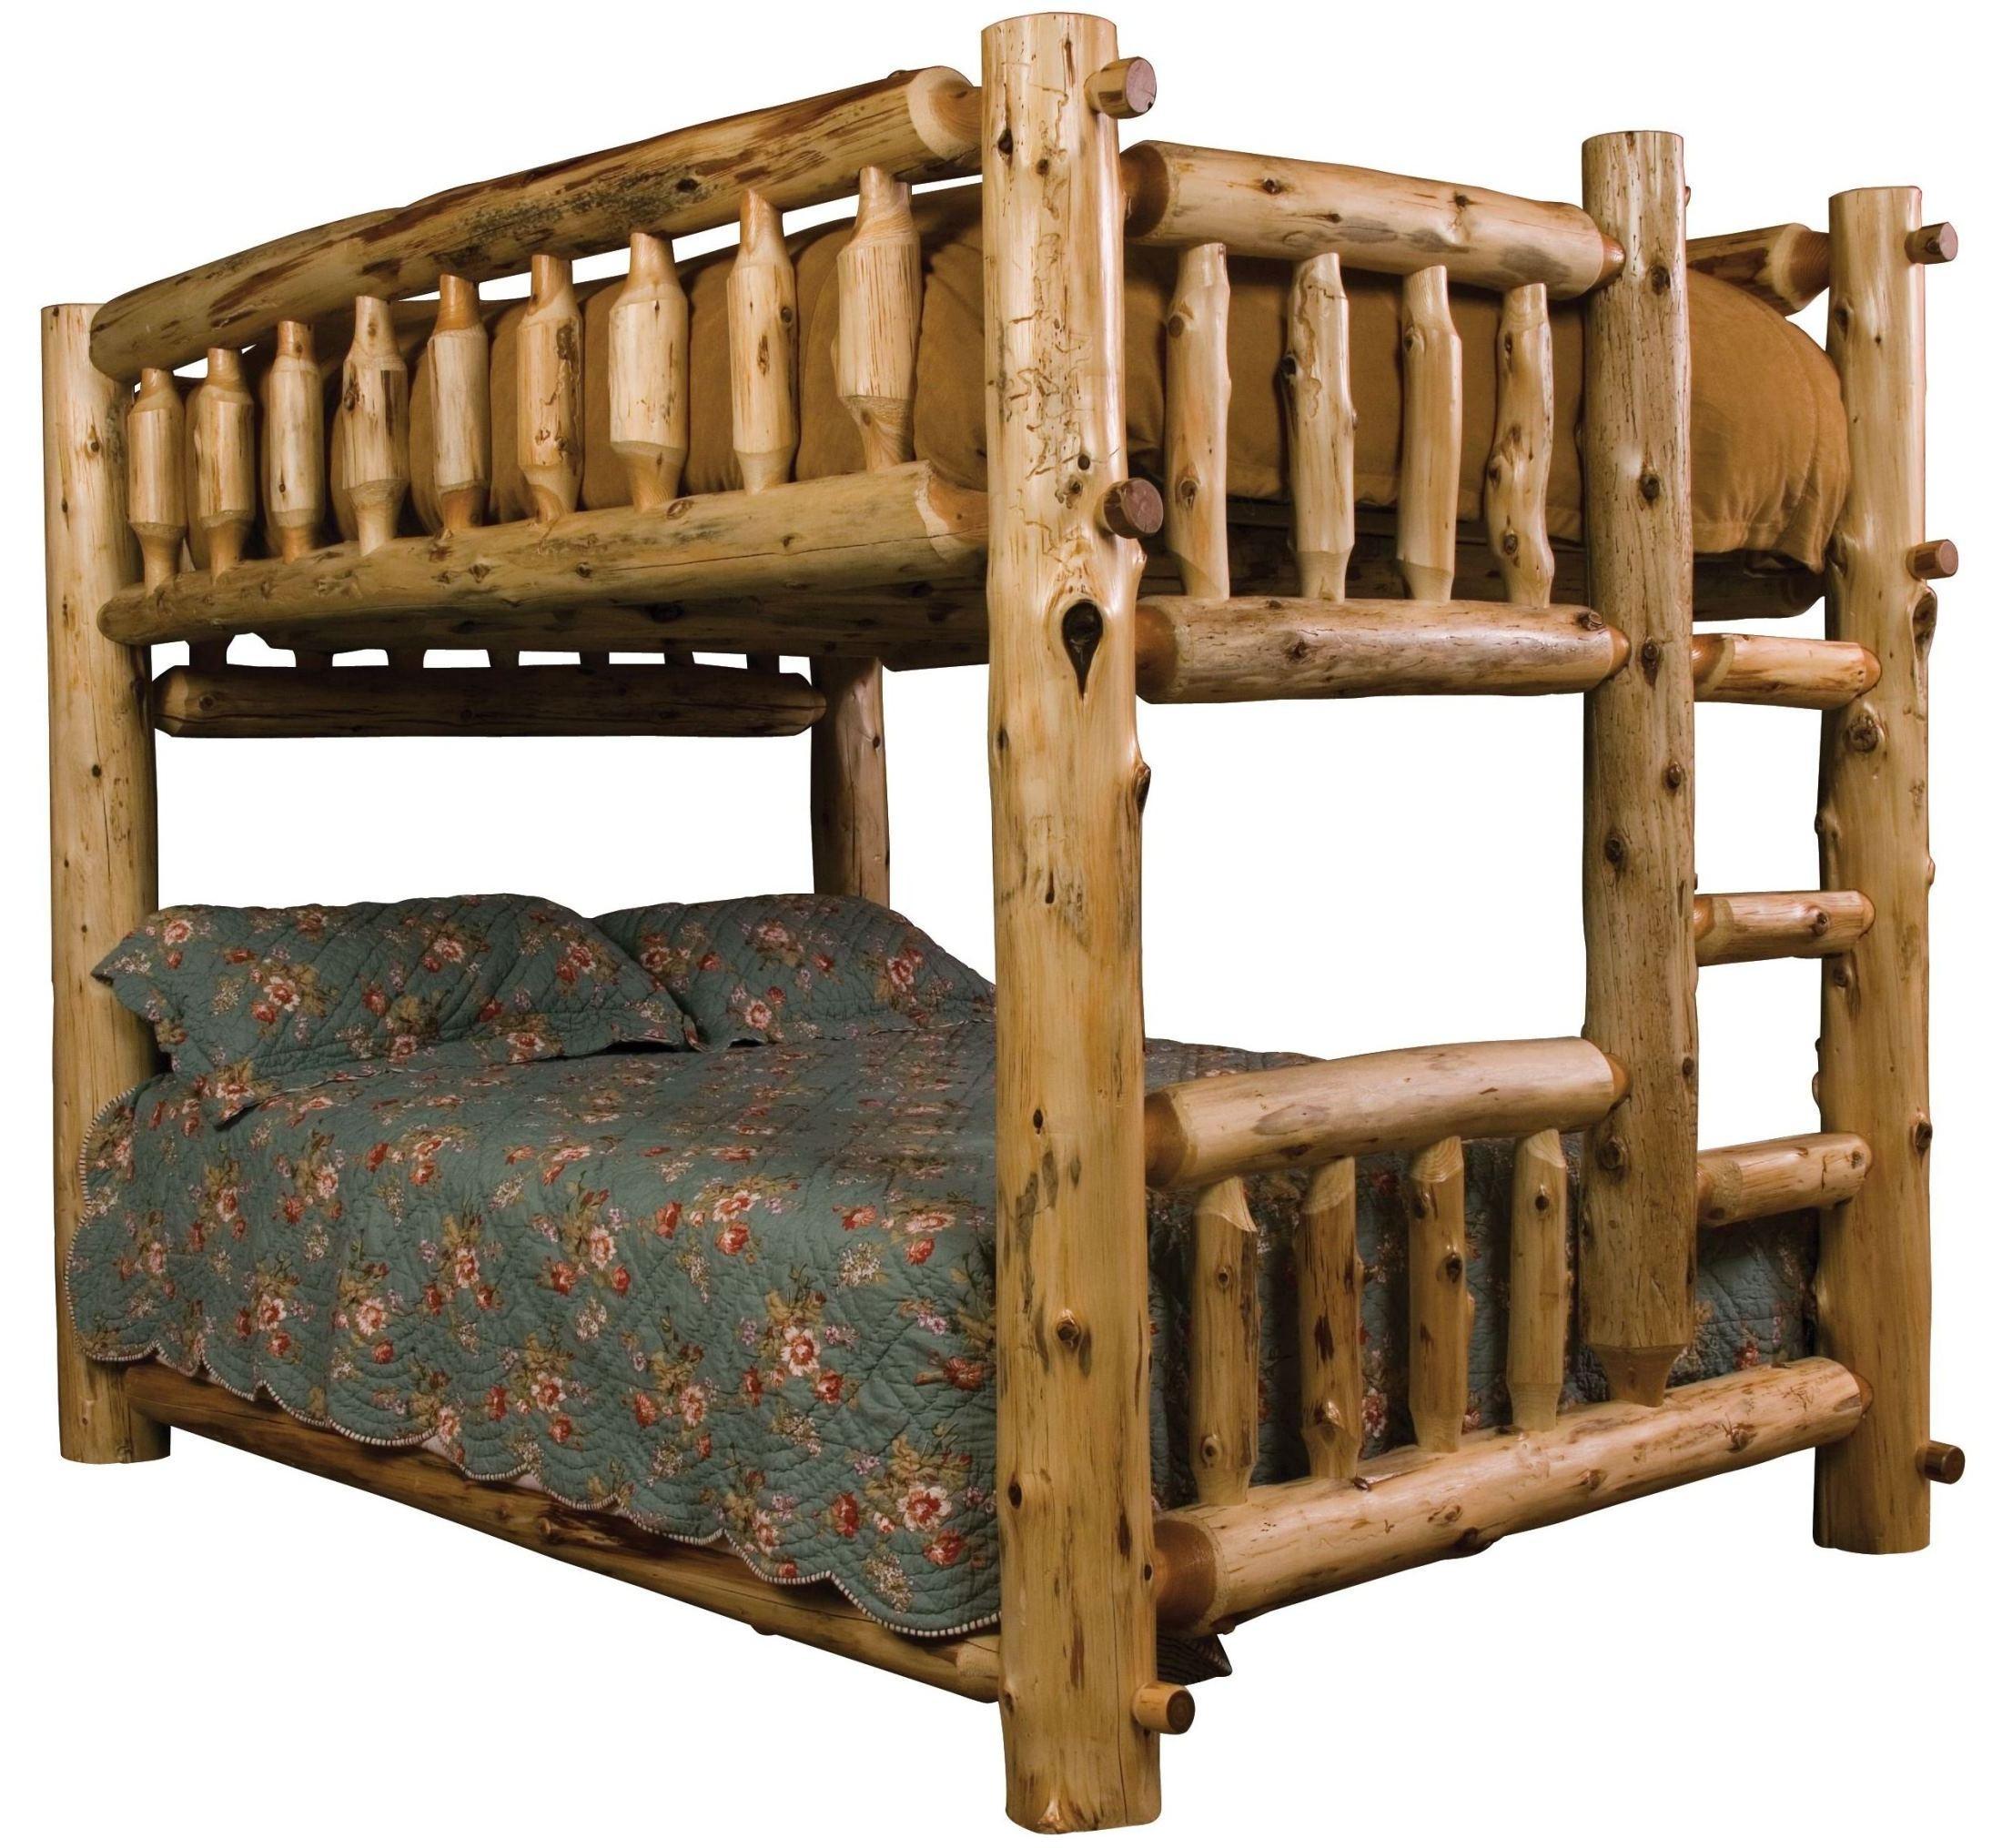 Cedar Right Full Over Full Bunk Bed From Fireside Lodge